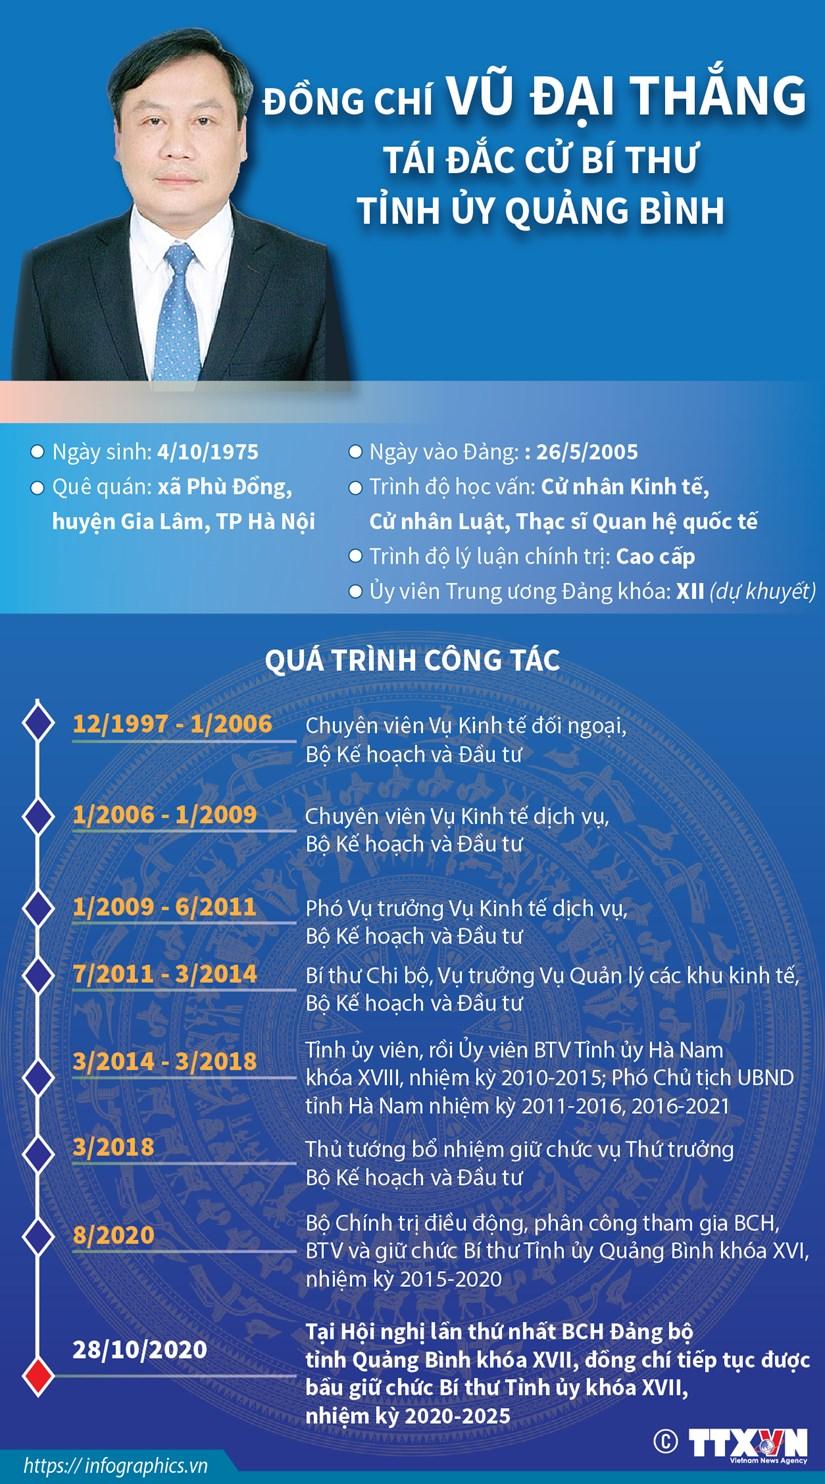 [Infographics] Ong Vu Dai Thang tai dac cu Bi thu Tinh uy Quang Binh hinh anh 1